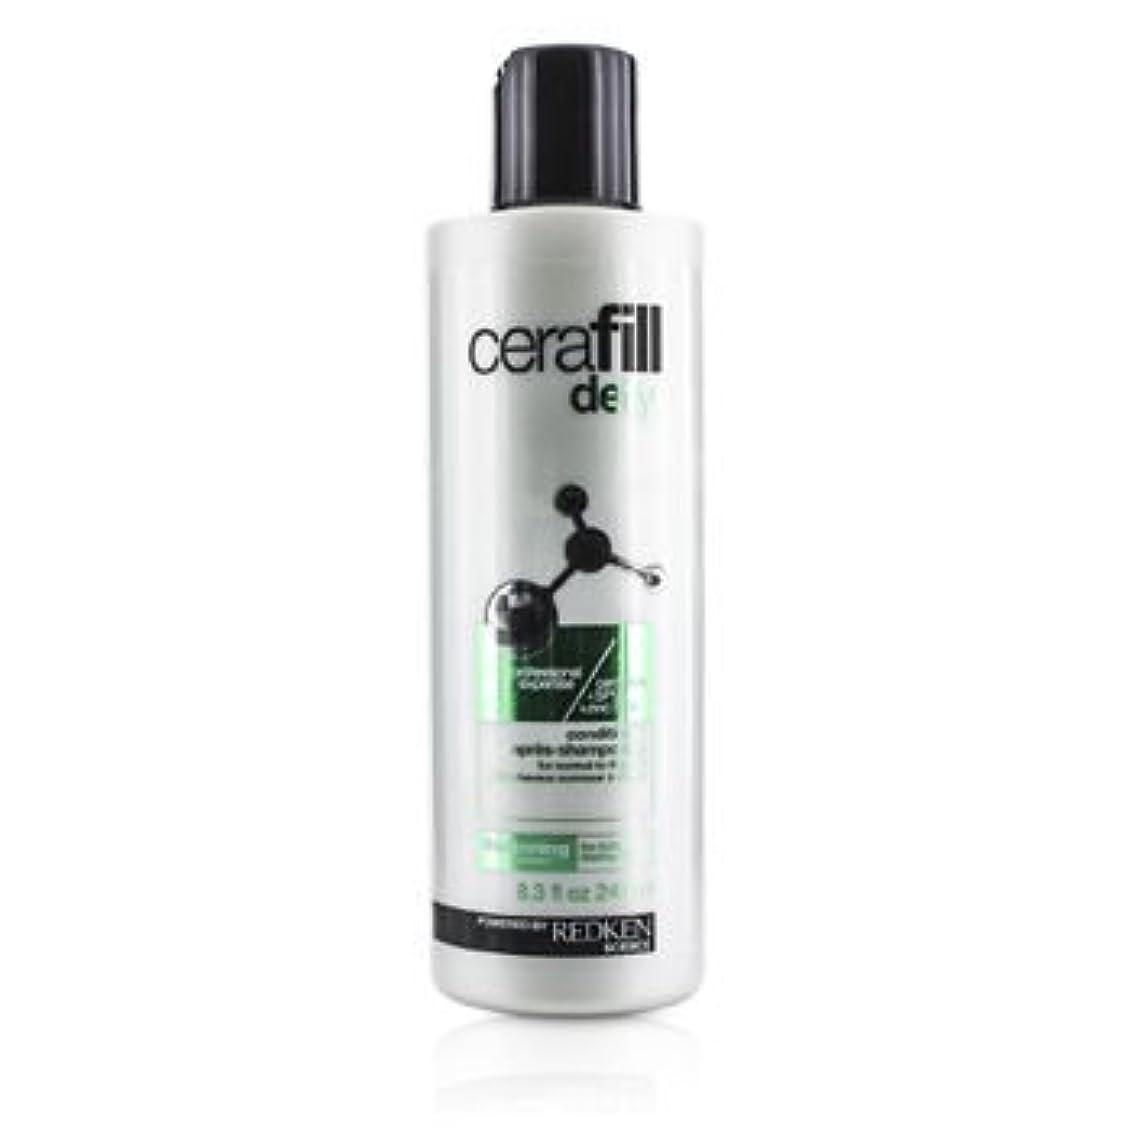 [Redken] Cerafill Defy Thickening Conditioner (For Normal to Thin Hair) 245ml/8.3oz